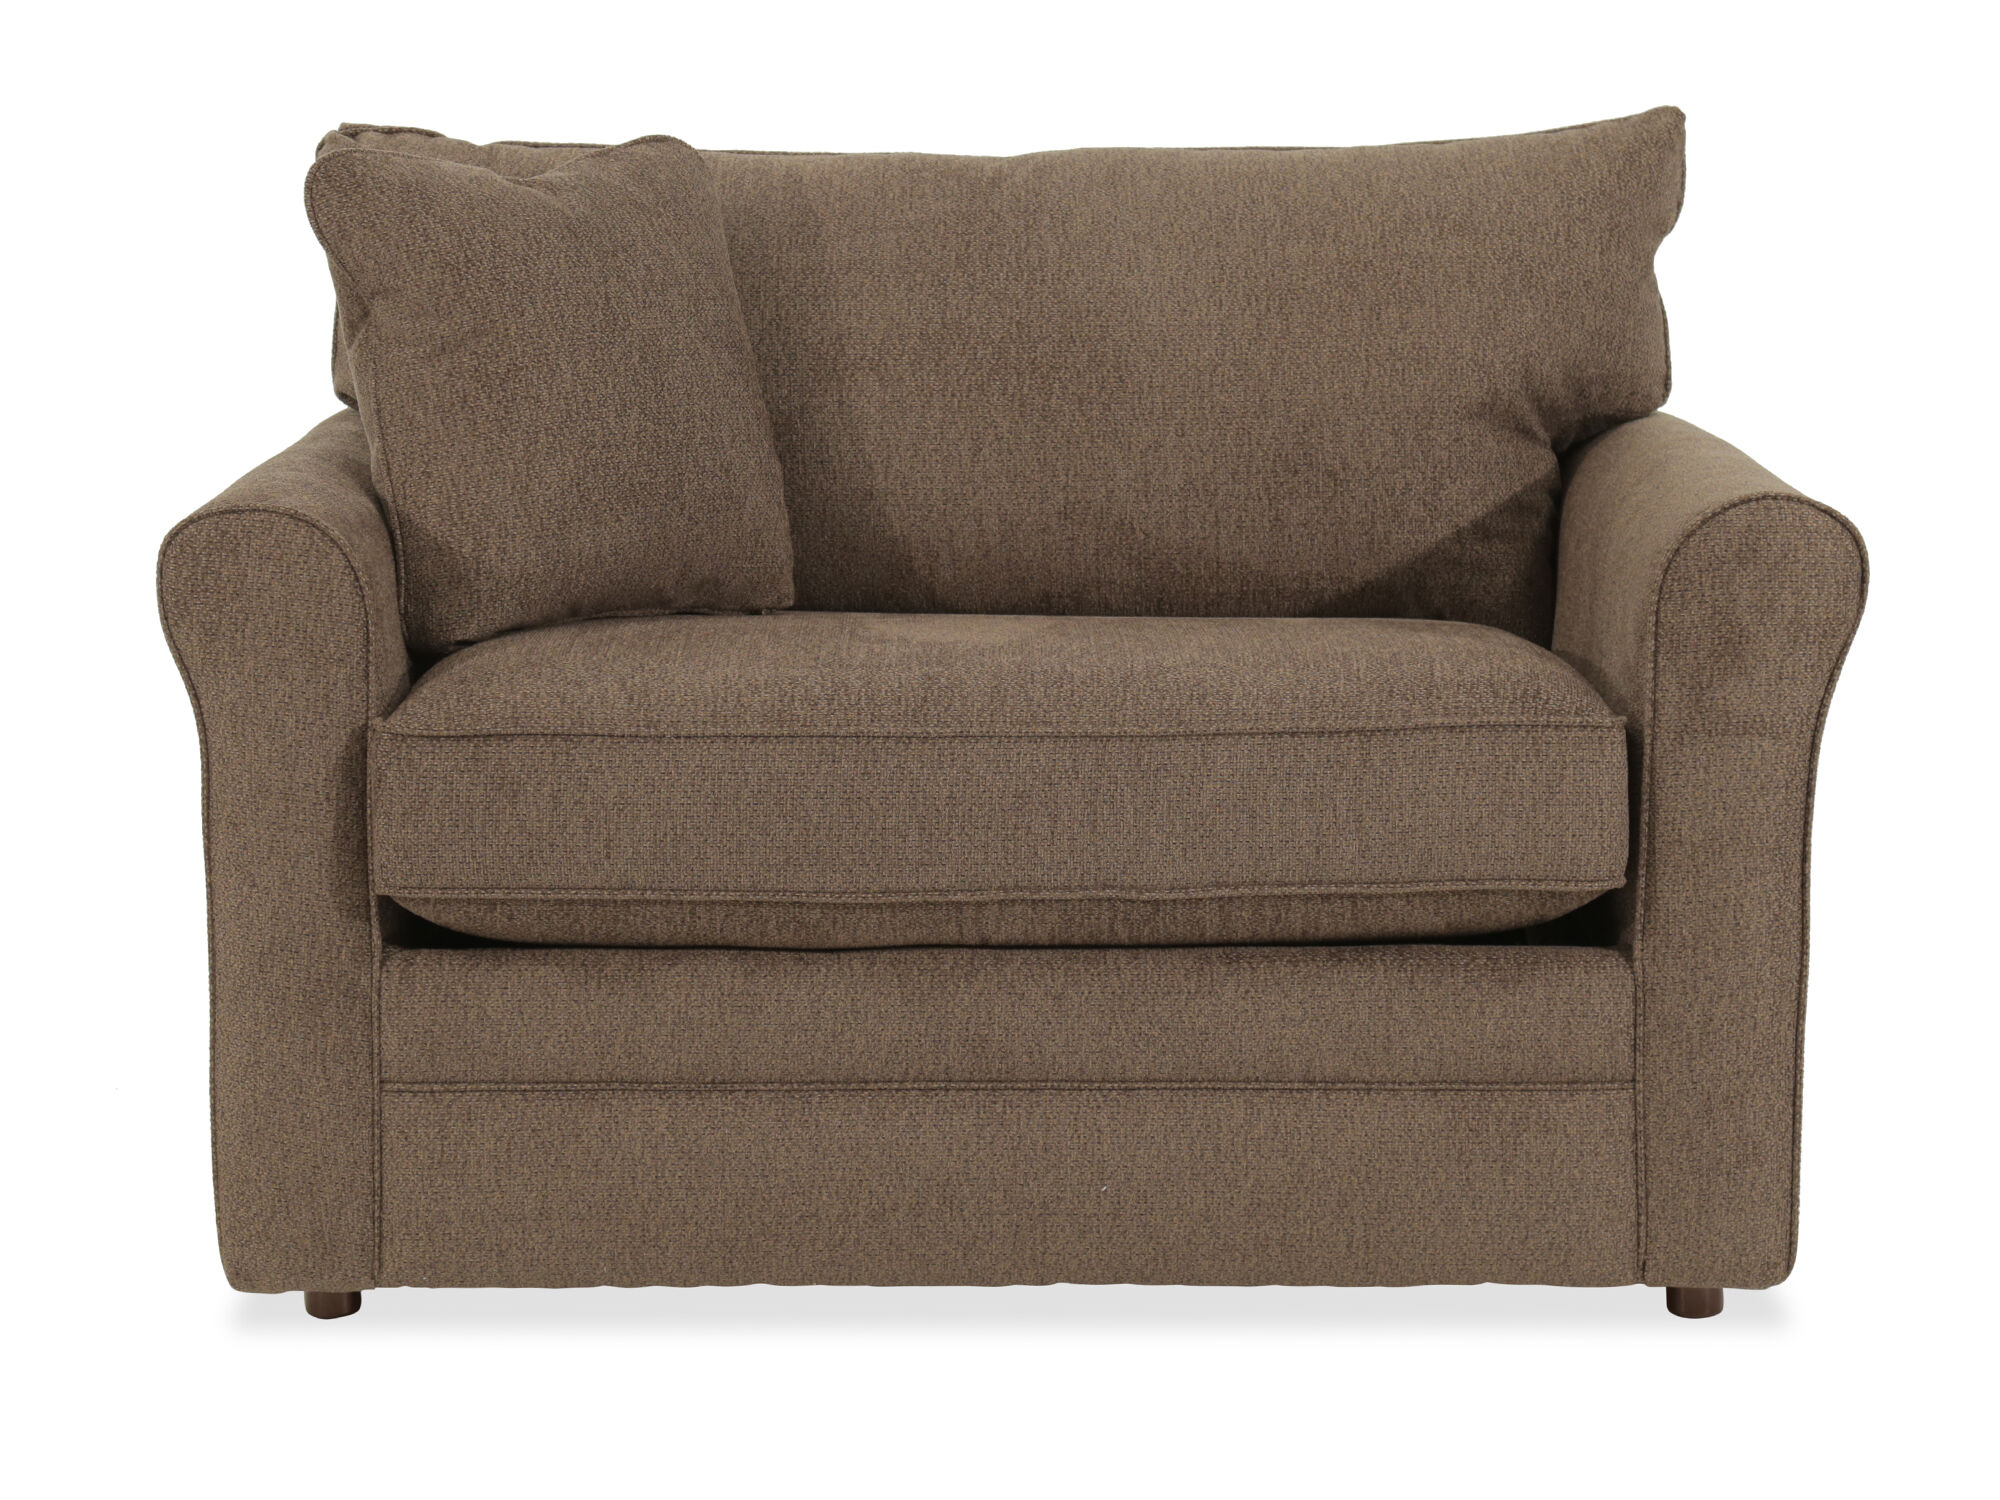 lazboy leah premier supreme comfort brown twin sleeper chair